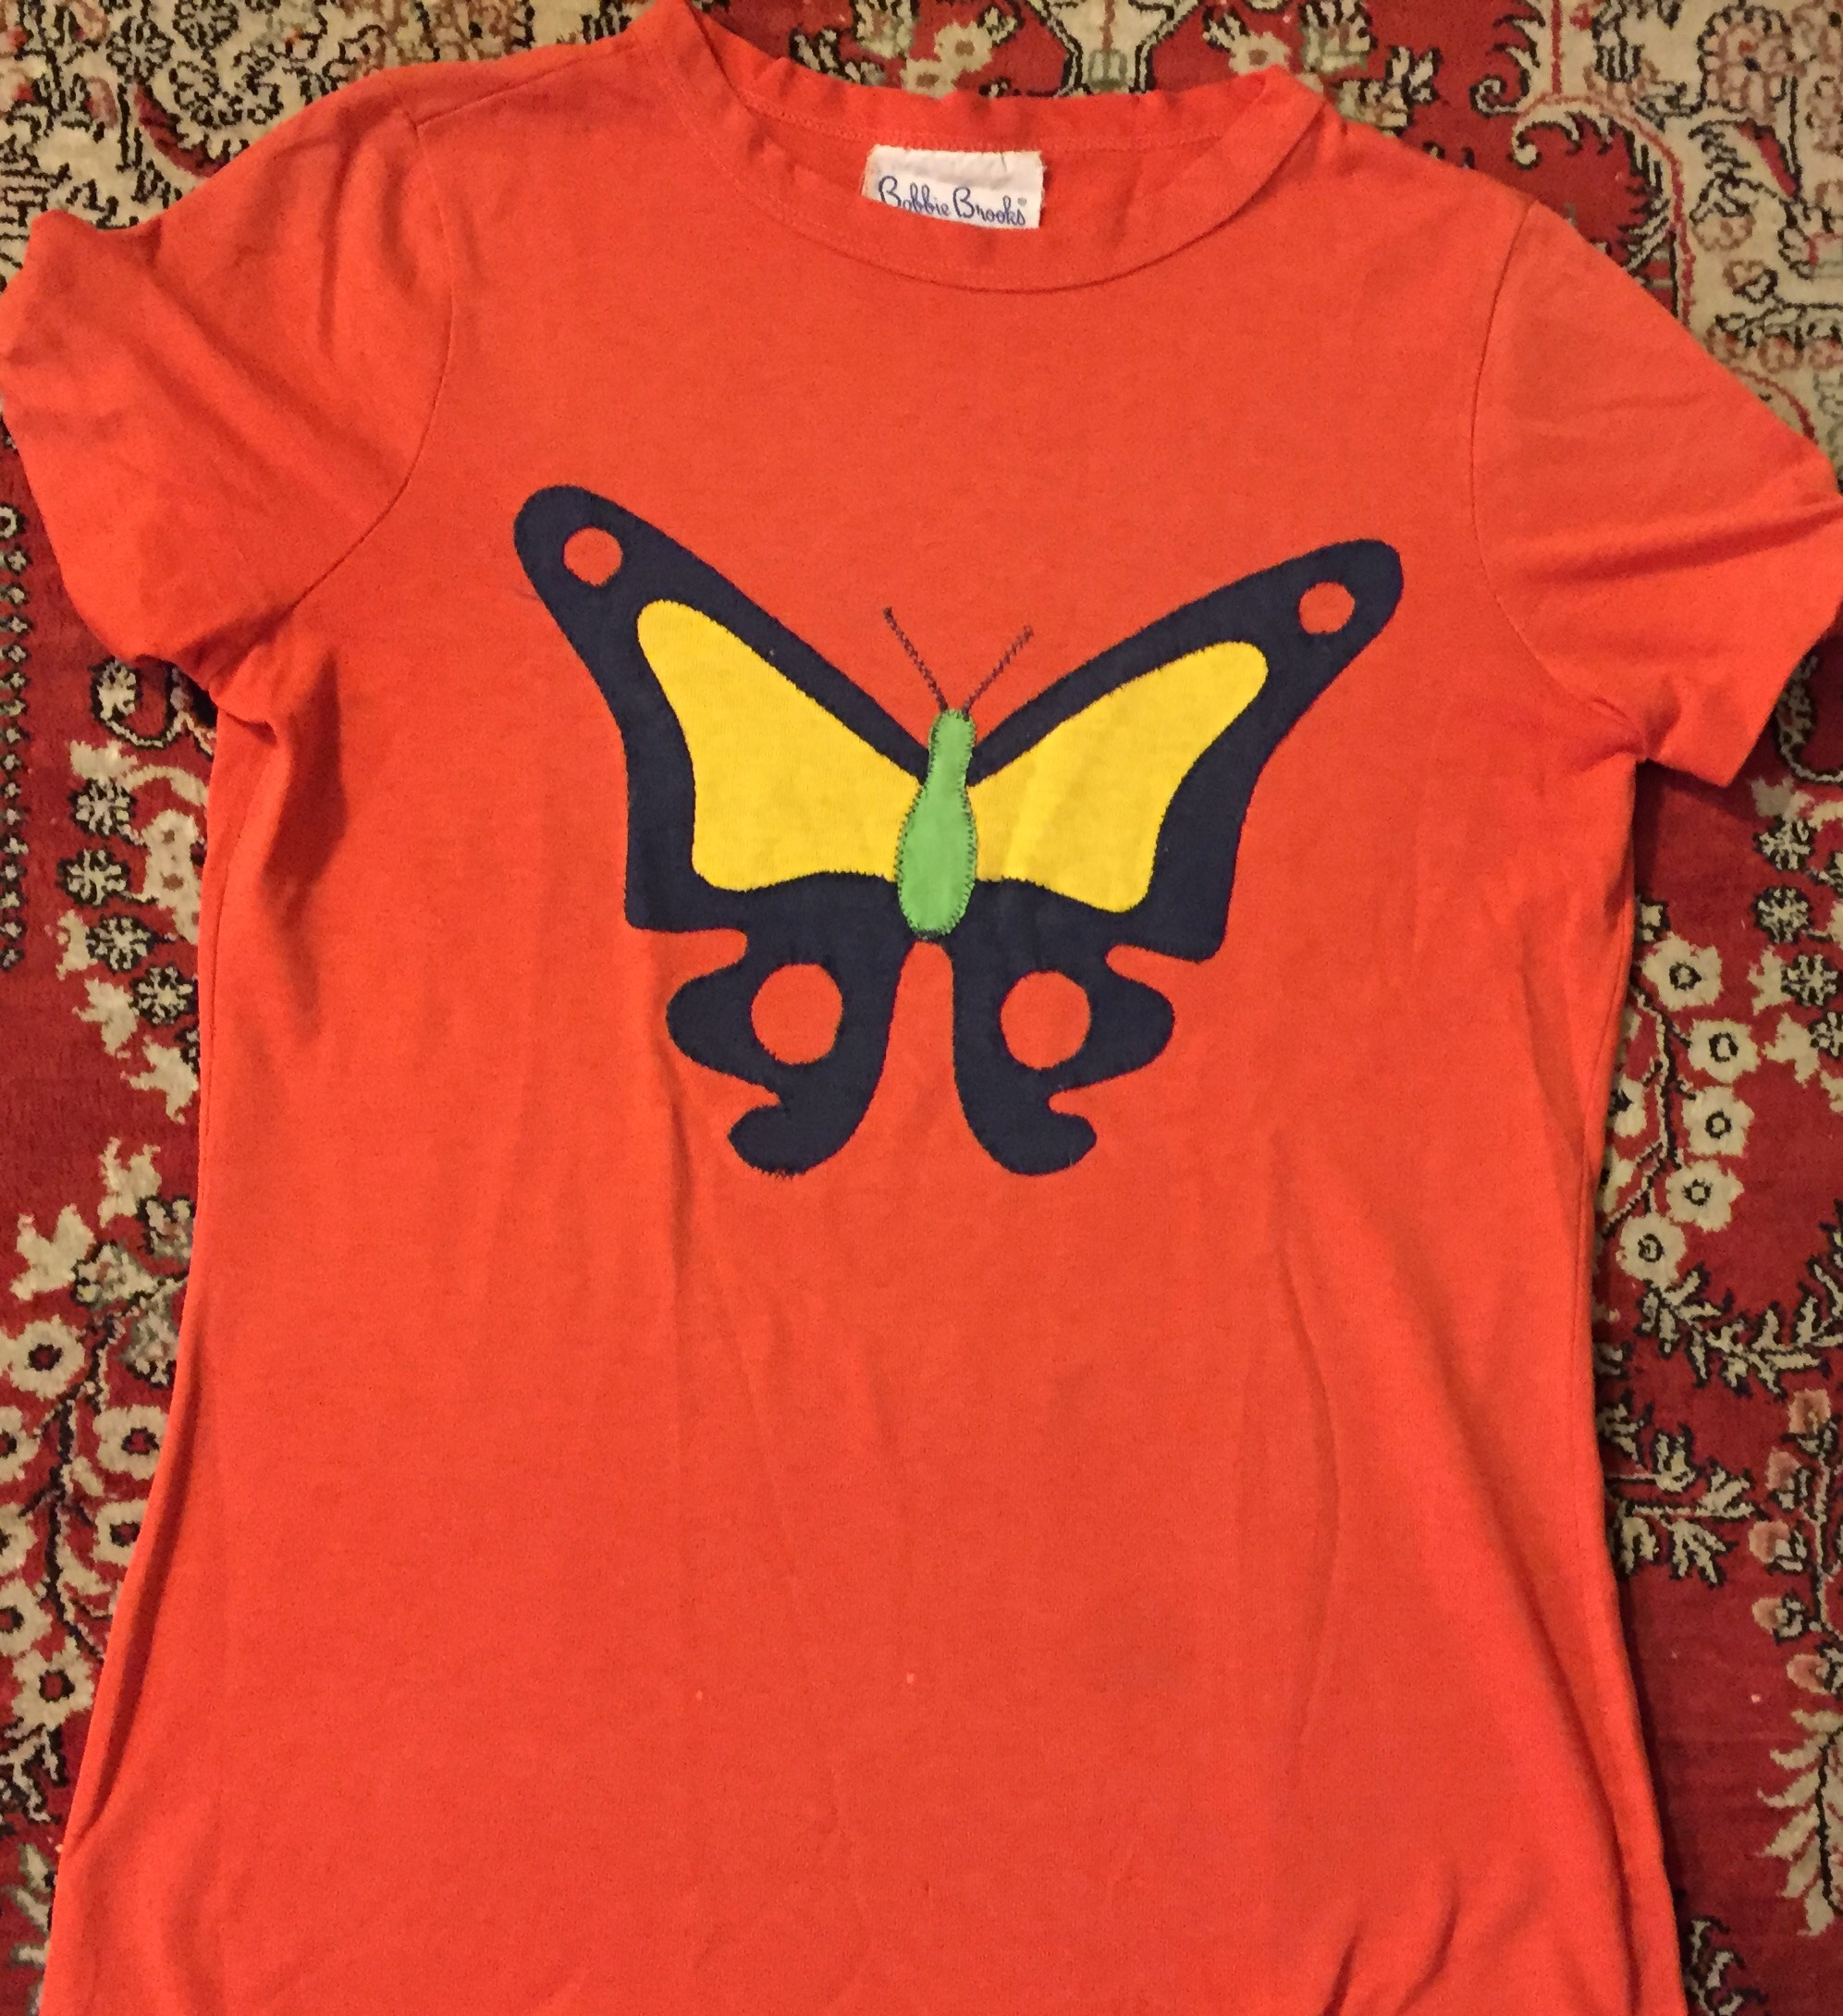 Mom's T-Shirt.